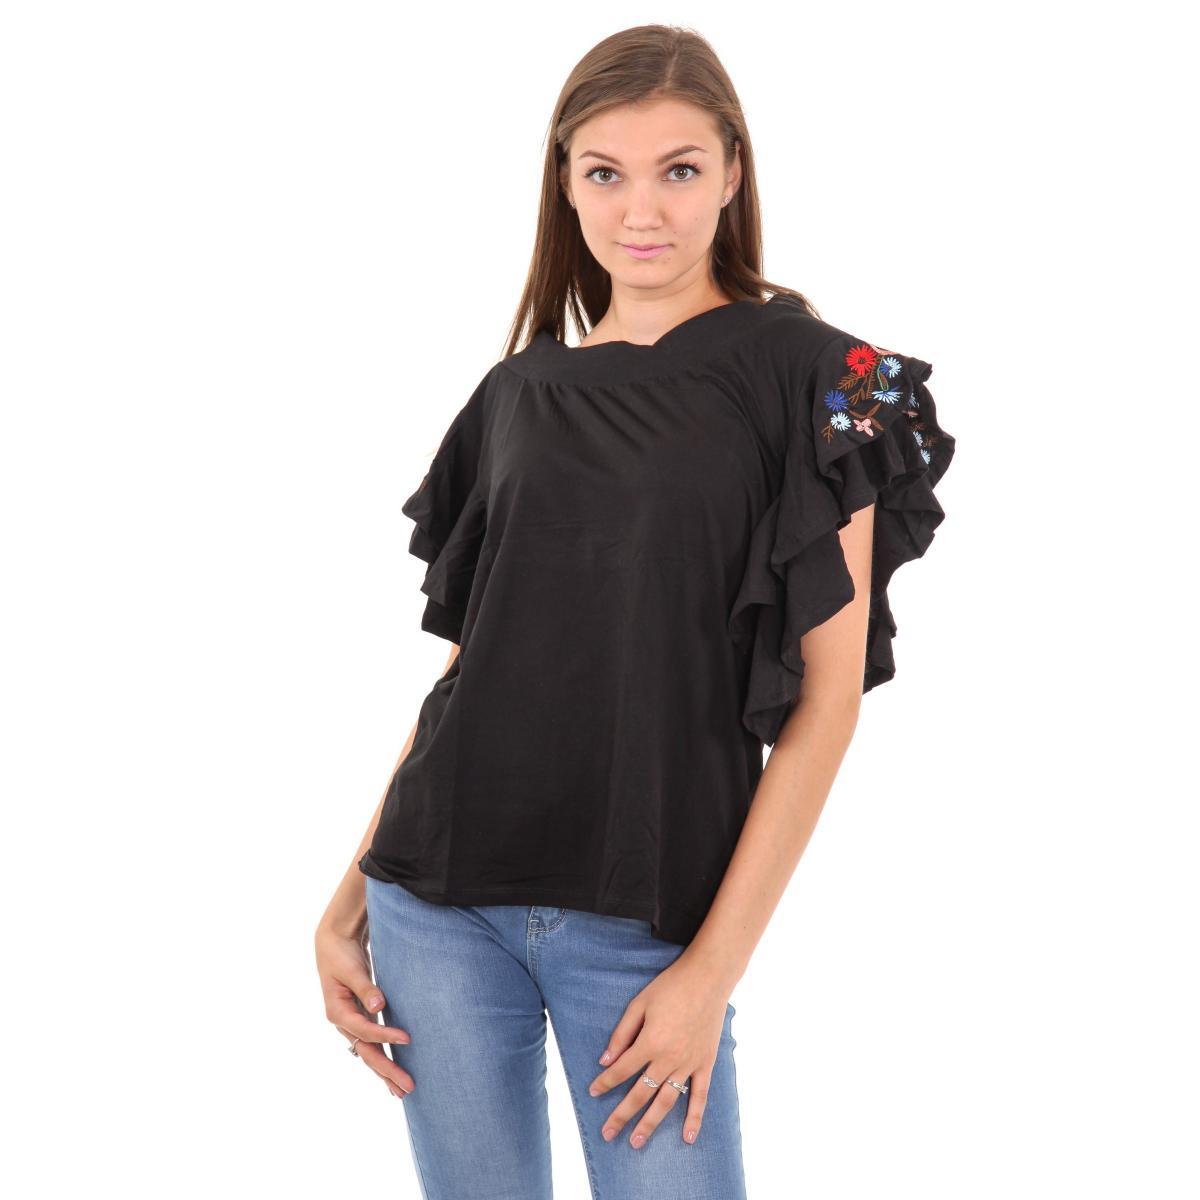 T-shirt con volant con ricami floreali da donna